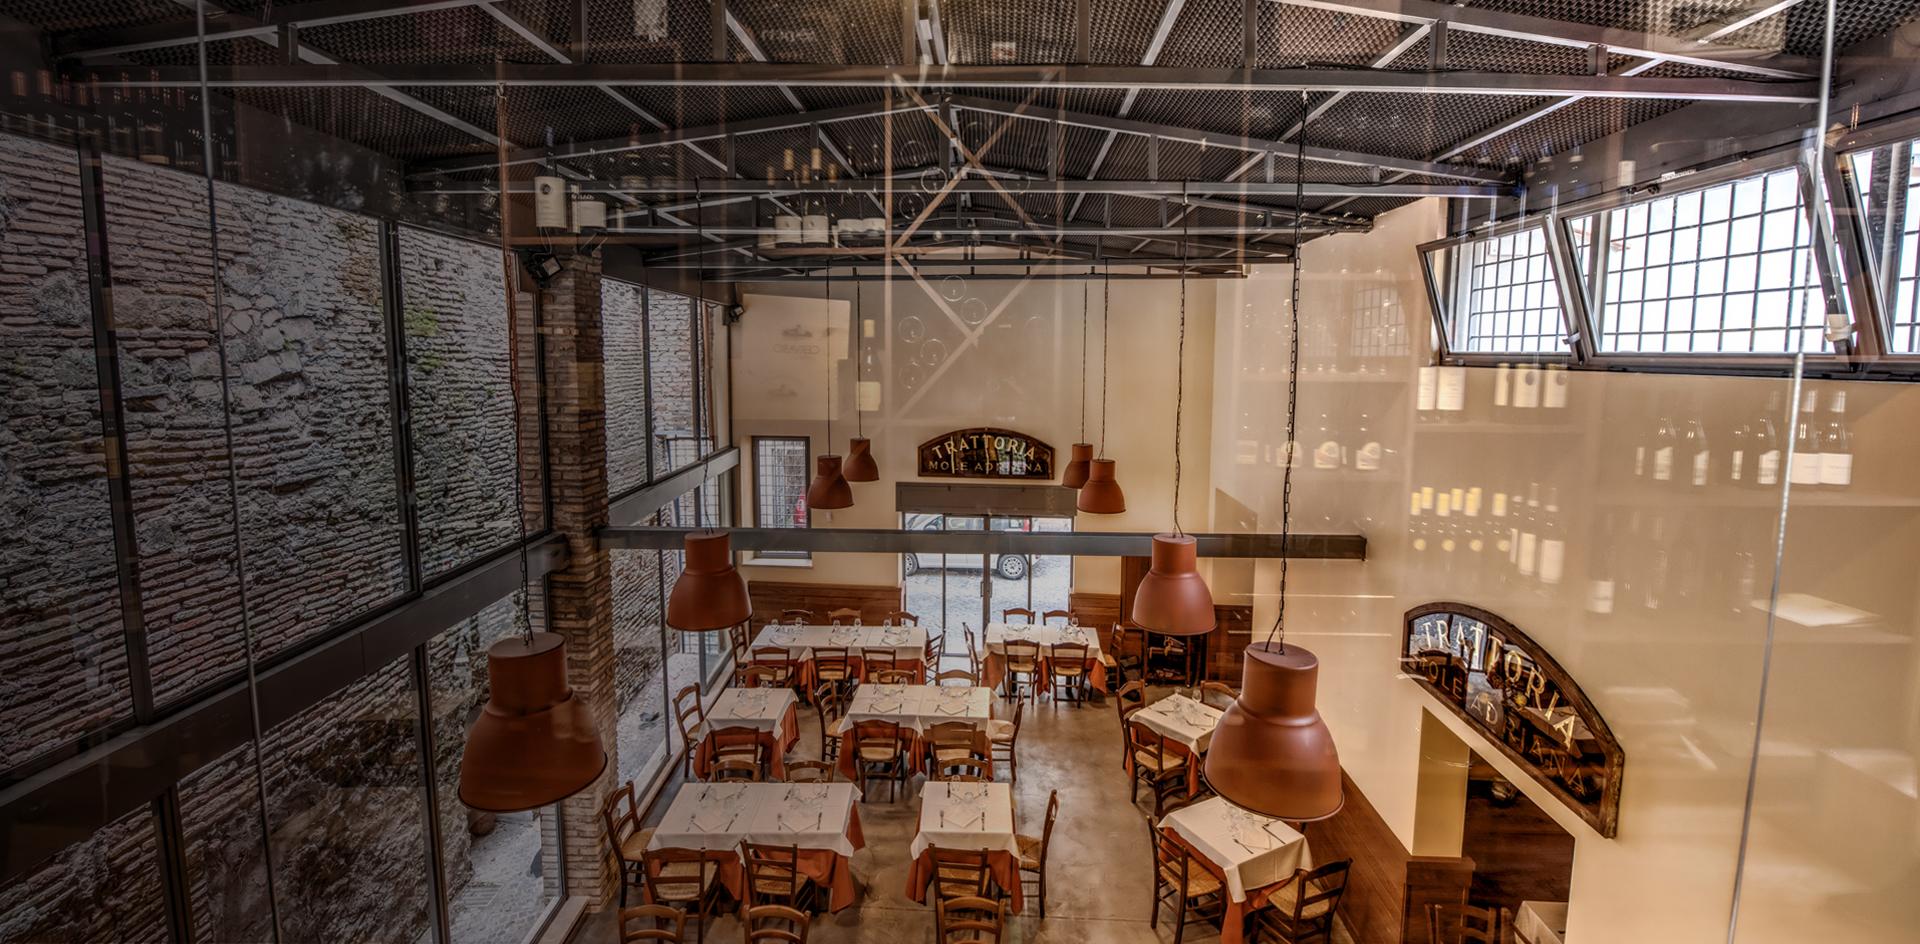 da Romolo restaurant - main dining area